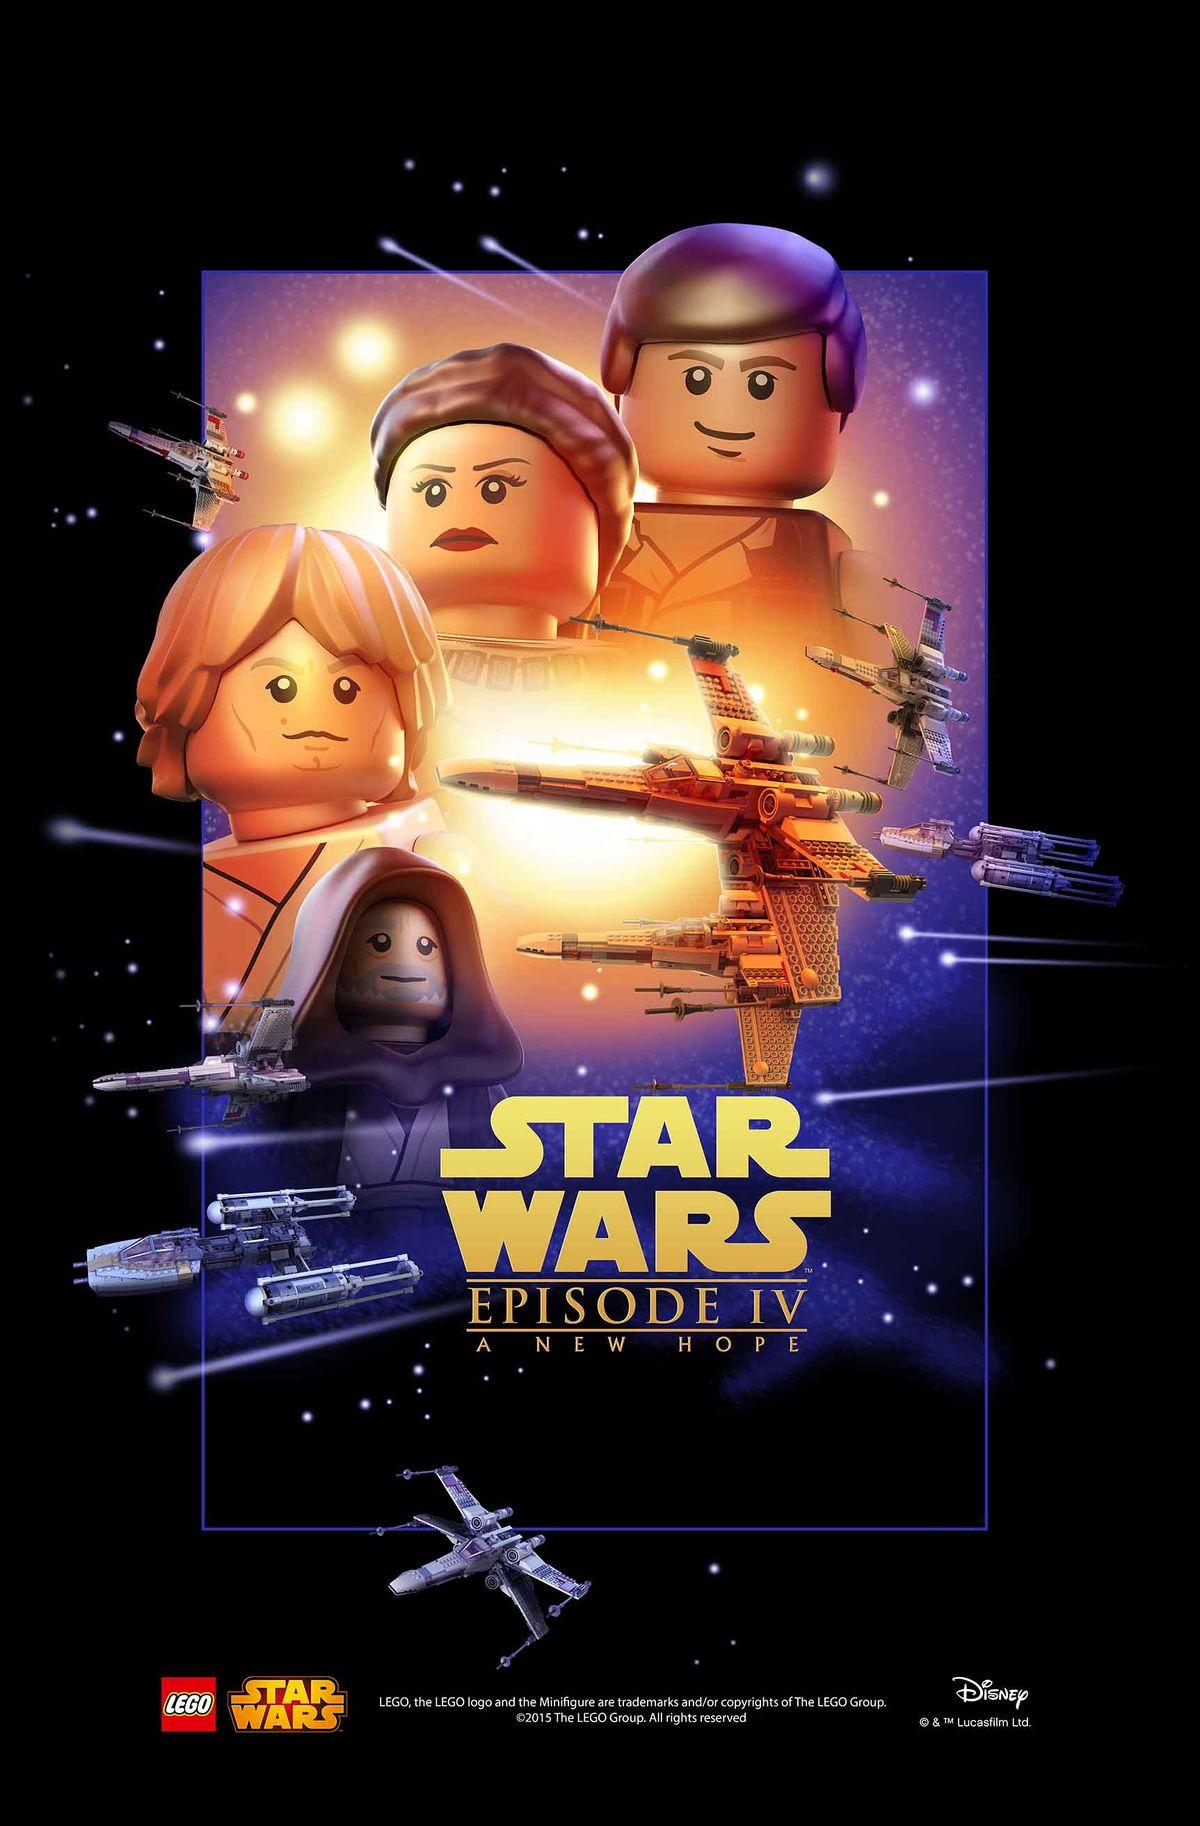 Star Wars Episode Iv A New Hope Brickipedia The Lego Wiki